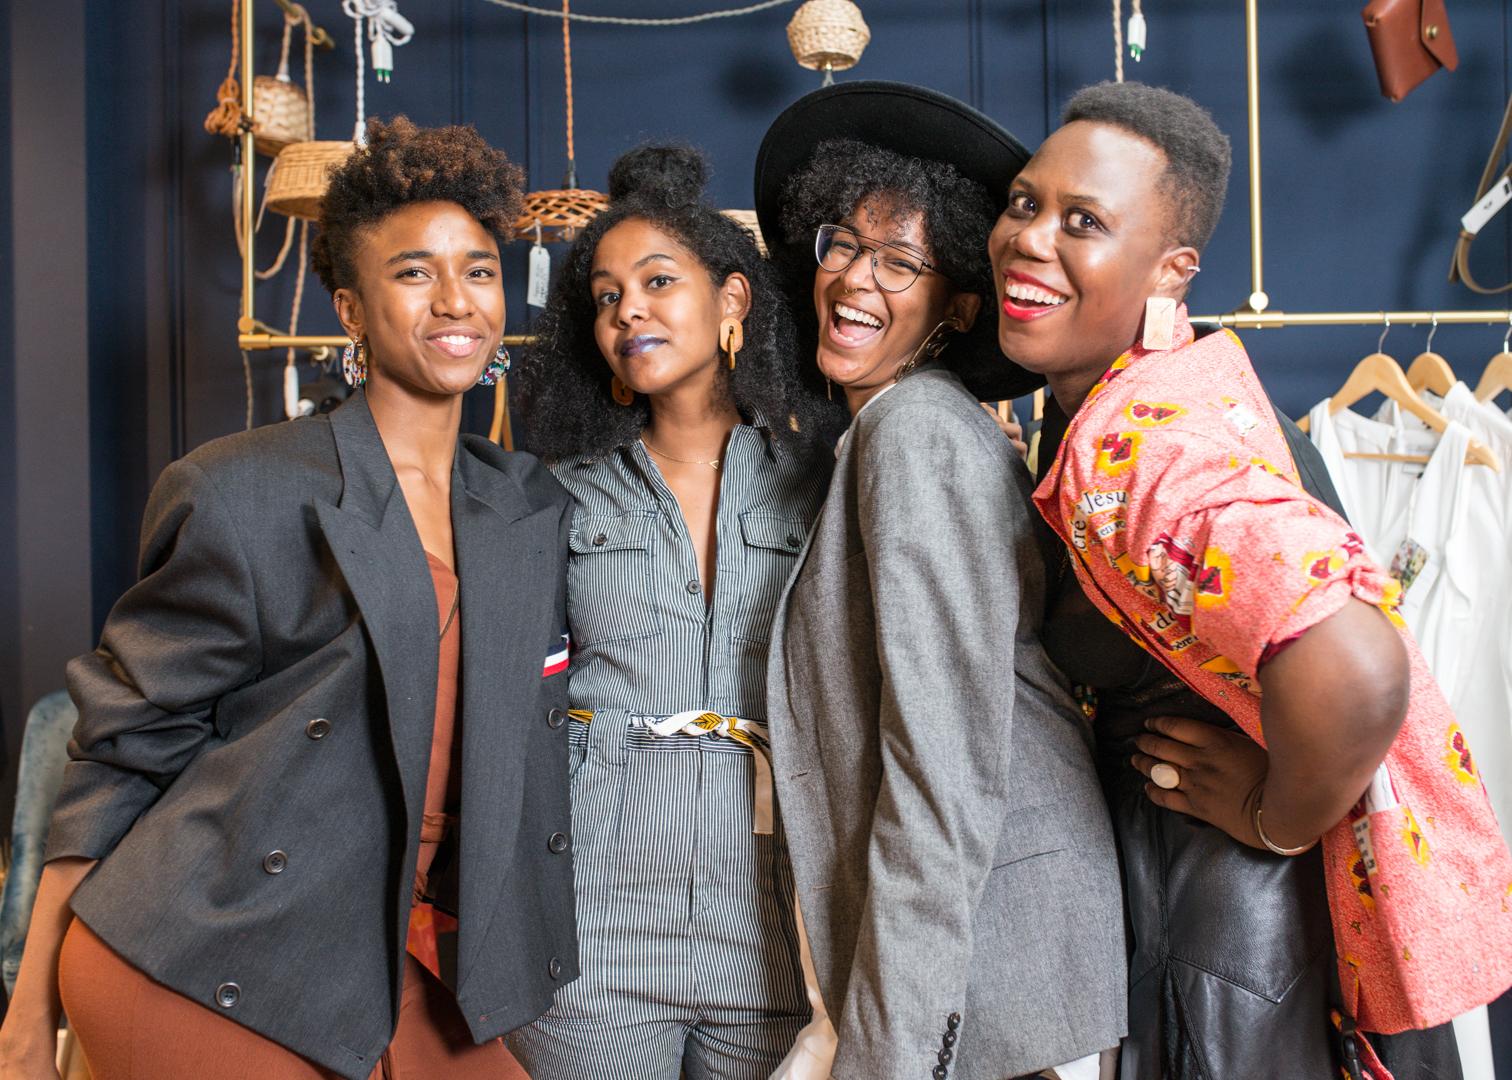 stylish black girls at fashion event